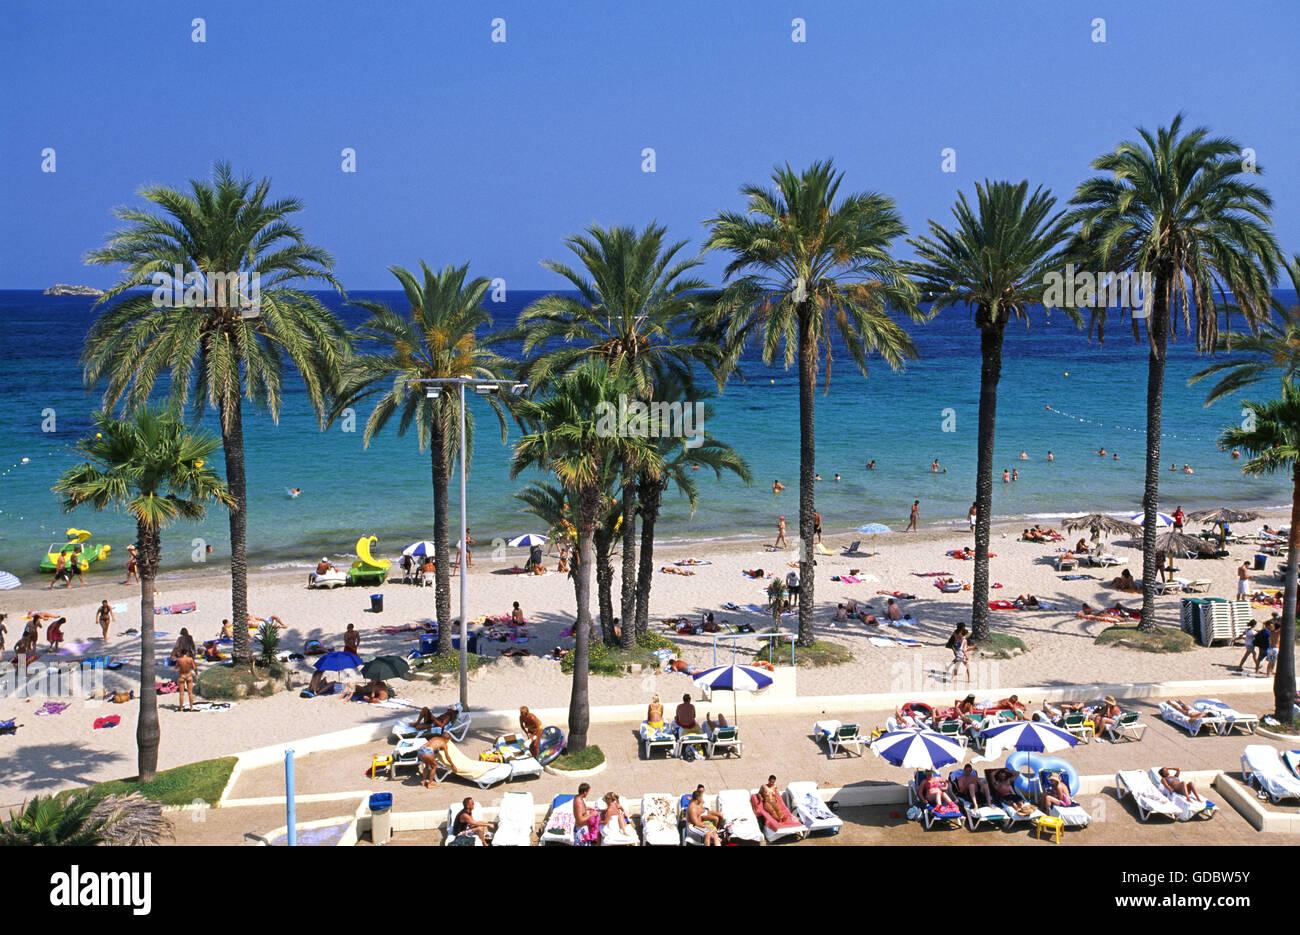 Playa Vermietungsbüros Bossa, Ibiza, Balearen, Spanien Stockbild